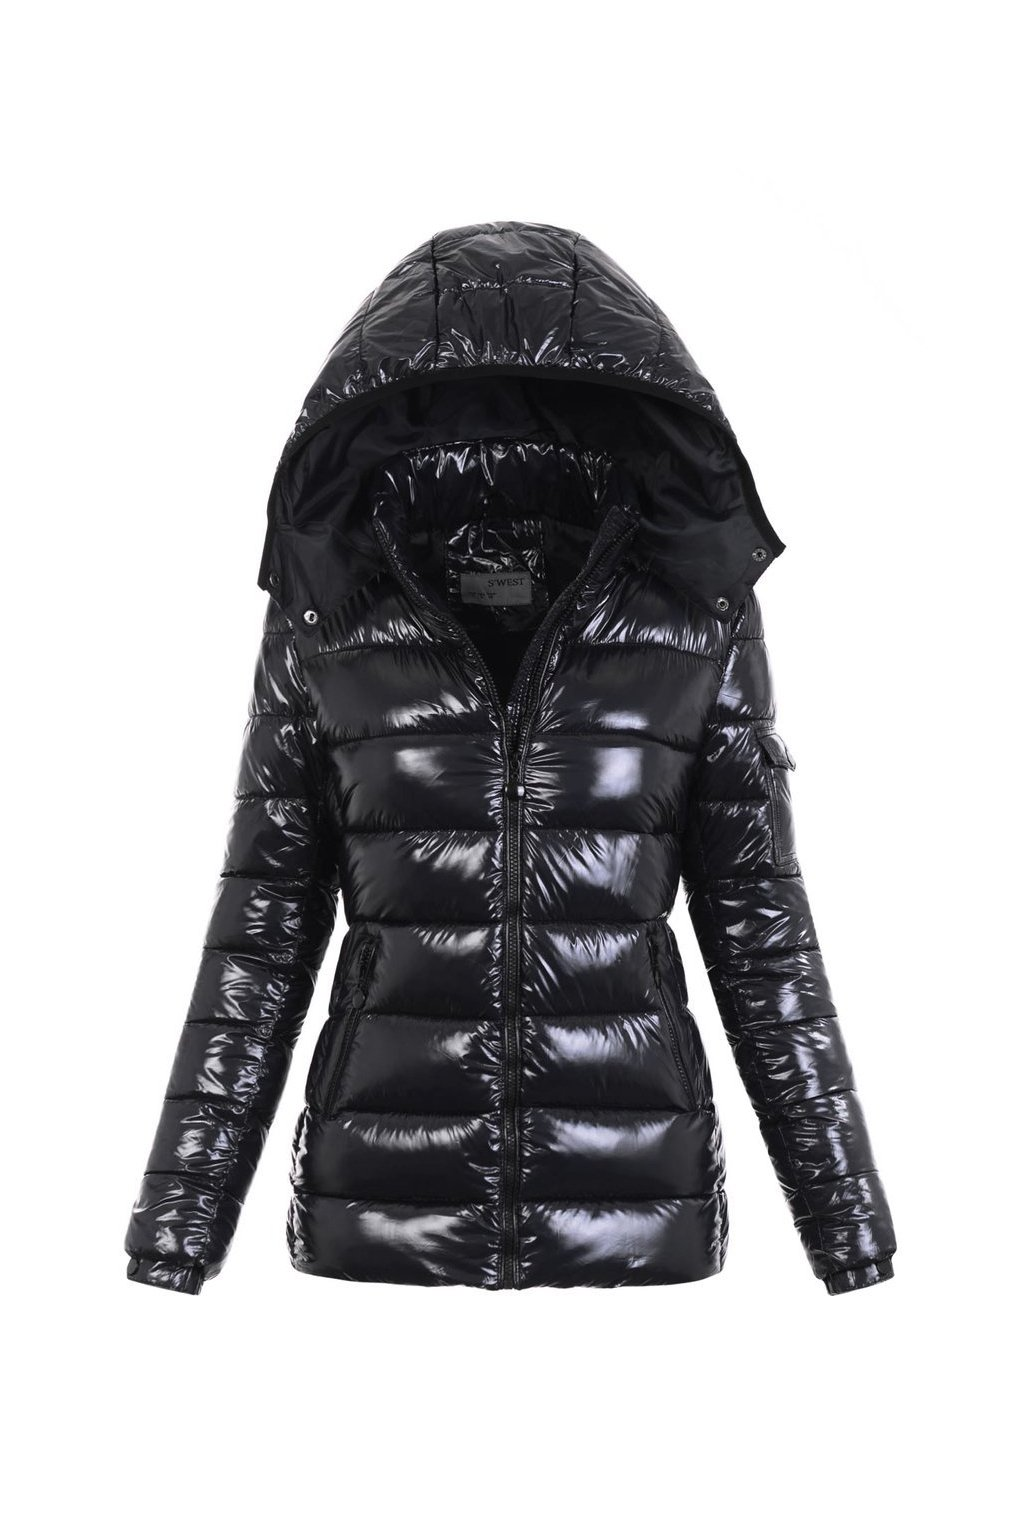 Dámska zimná bunda s kapucňou 5997 čierna